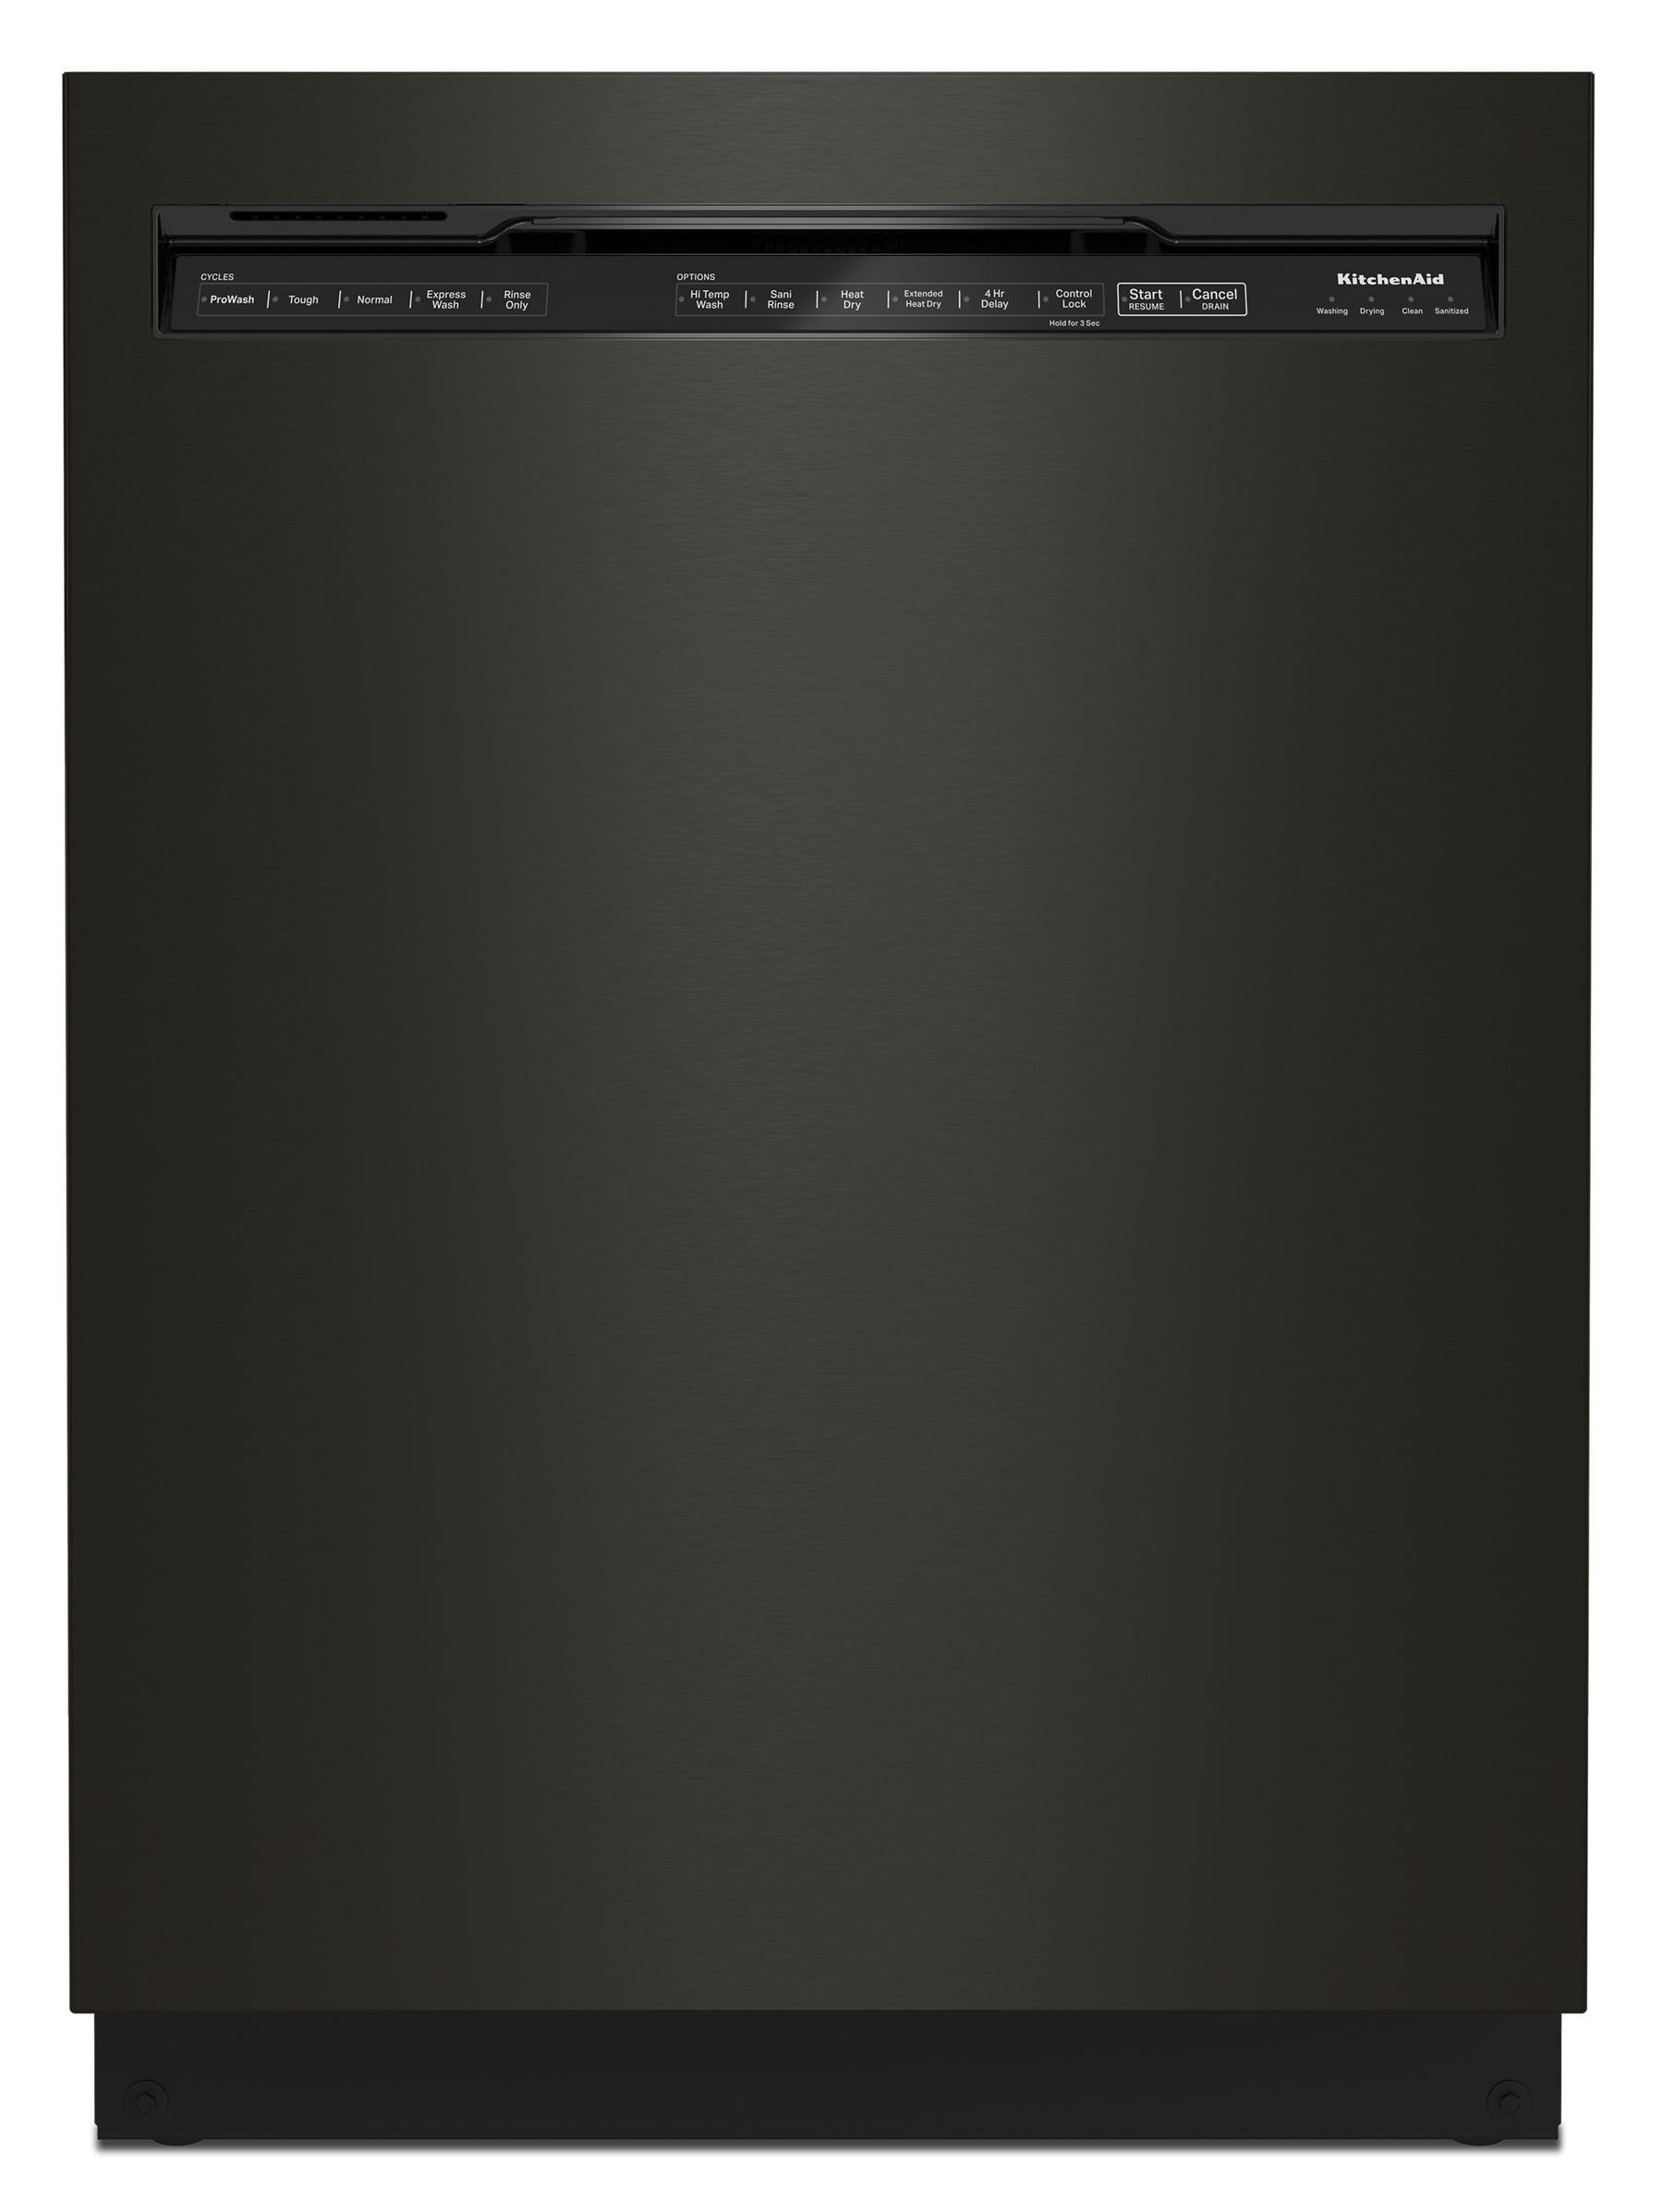 KitchenAid39 Dba Dishwasher In Printshield™ Finish With Third Level Utensil Rack - Black Stainless Steel With Printshield™ Finish